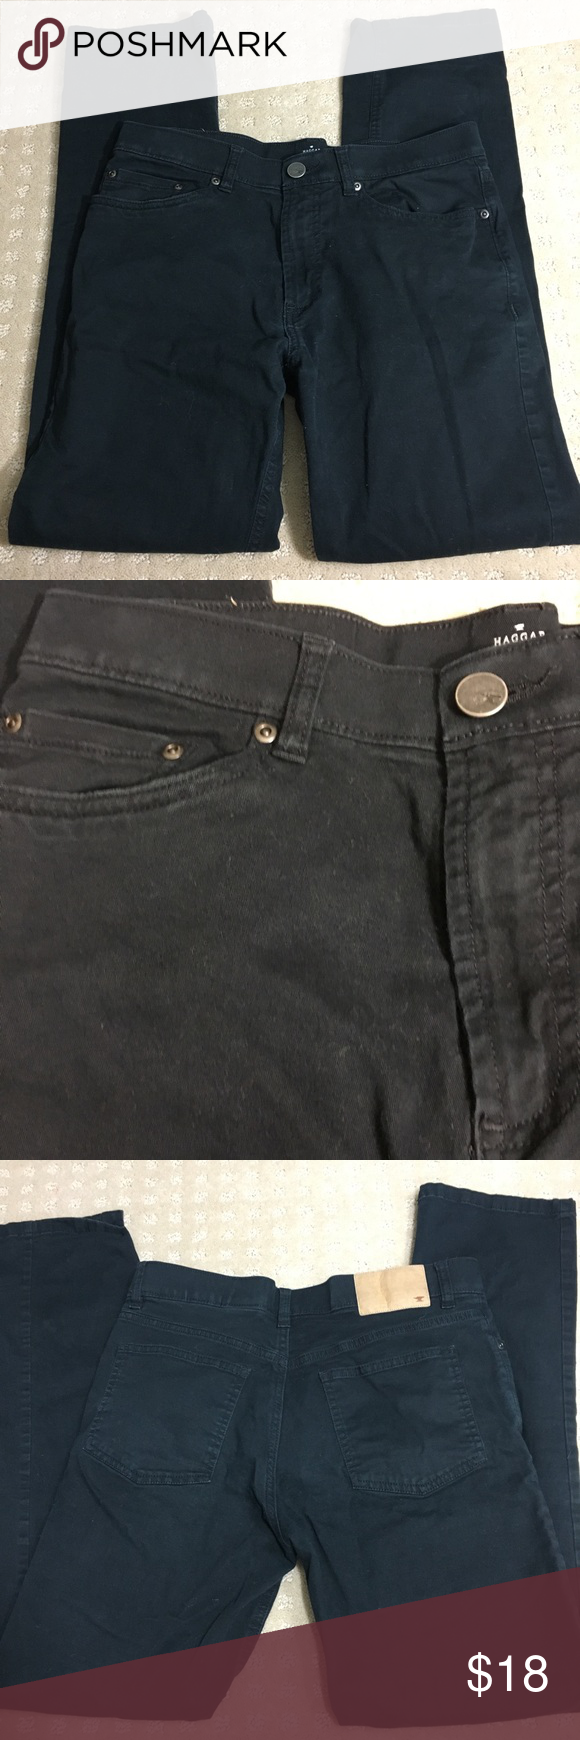 Haggar H26 Slim Black Jeans Black Jeans Black Chino Pants Chinos Style